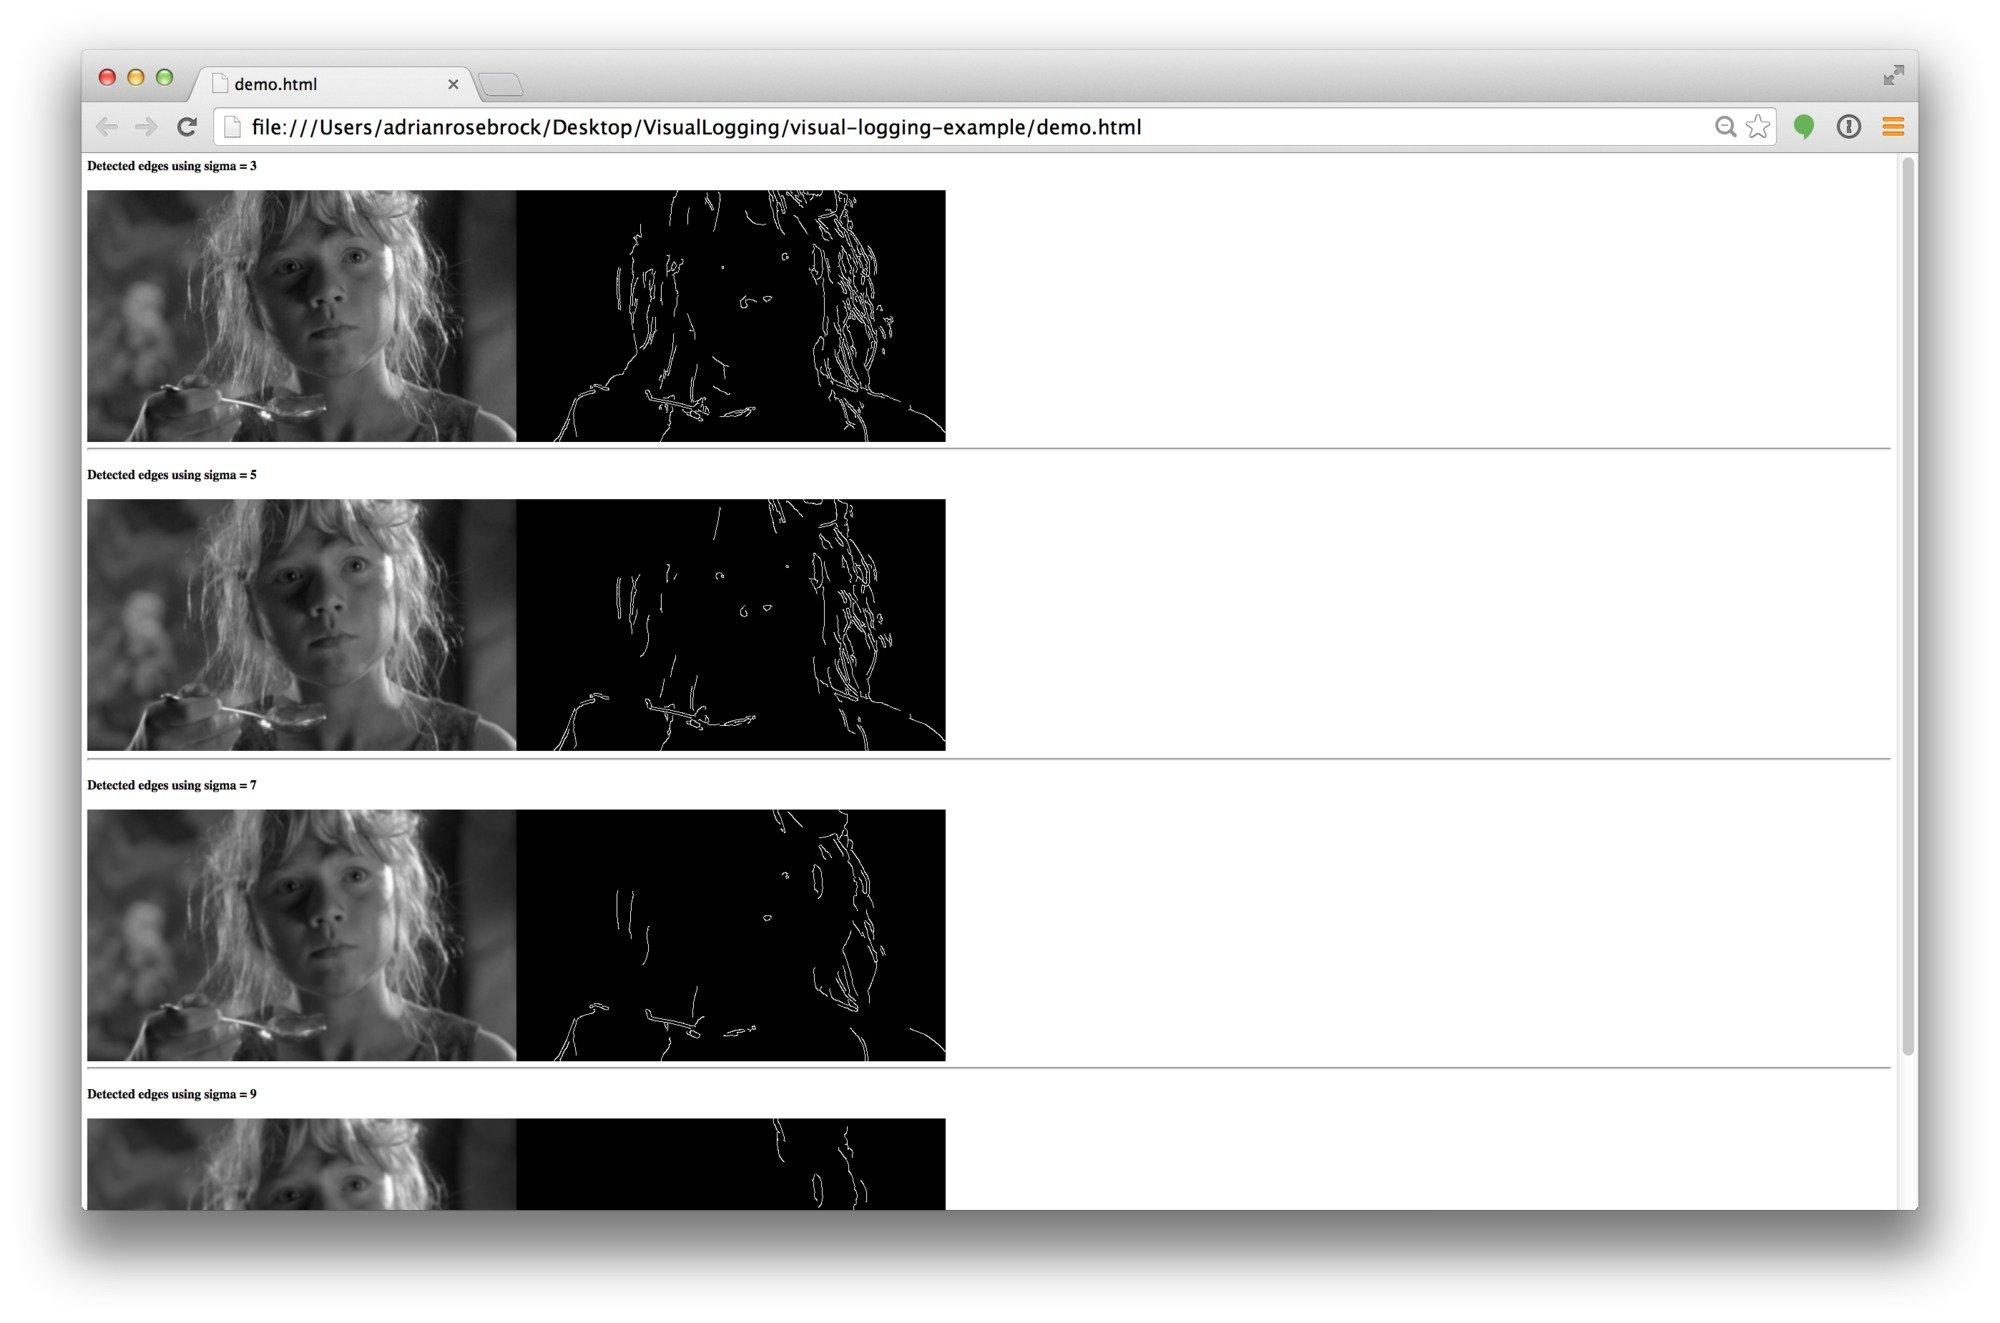 visual-logging, my new favorite tool for debugging OpenCV